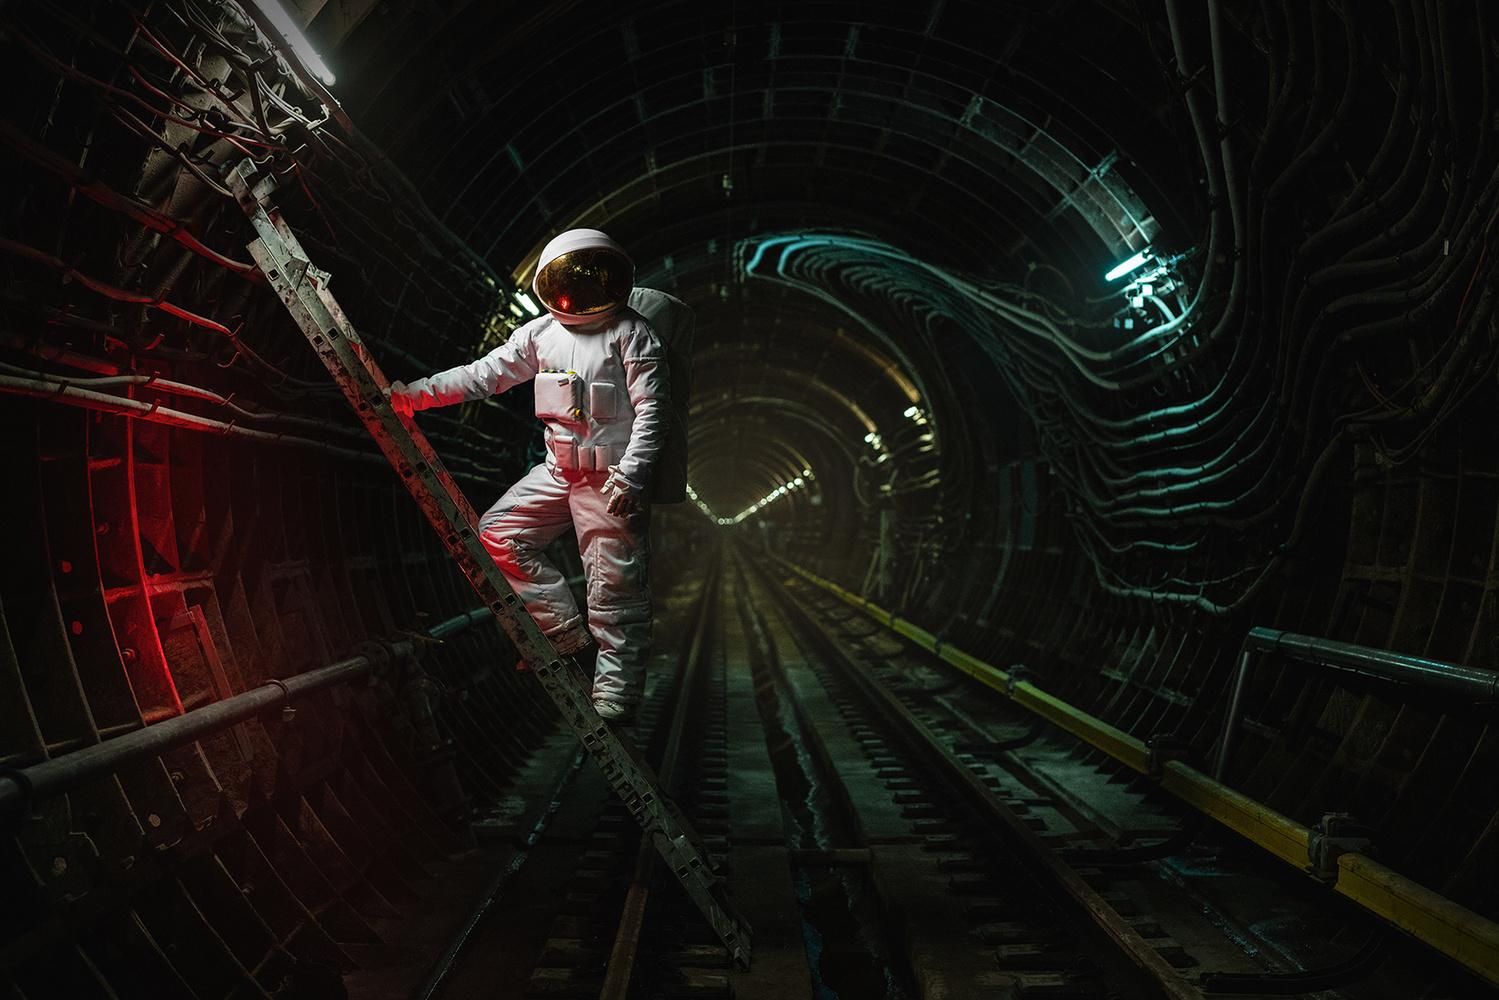 Underground Orbit by Ilya Nodia